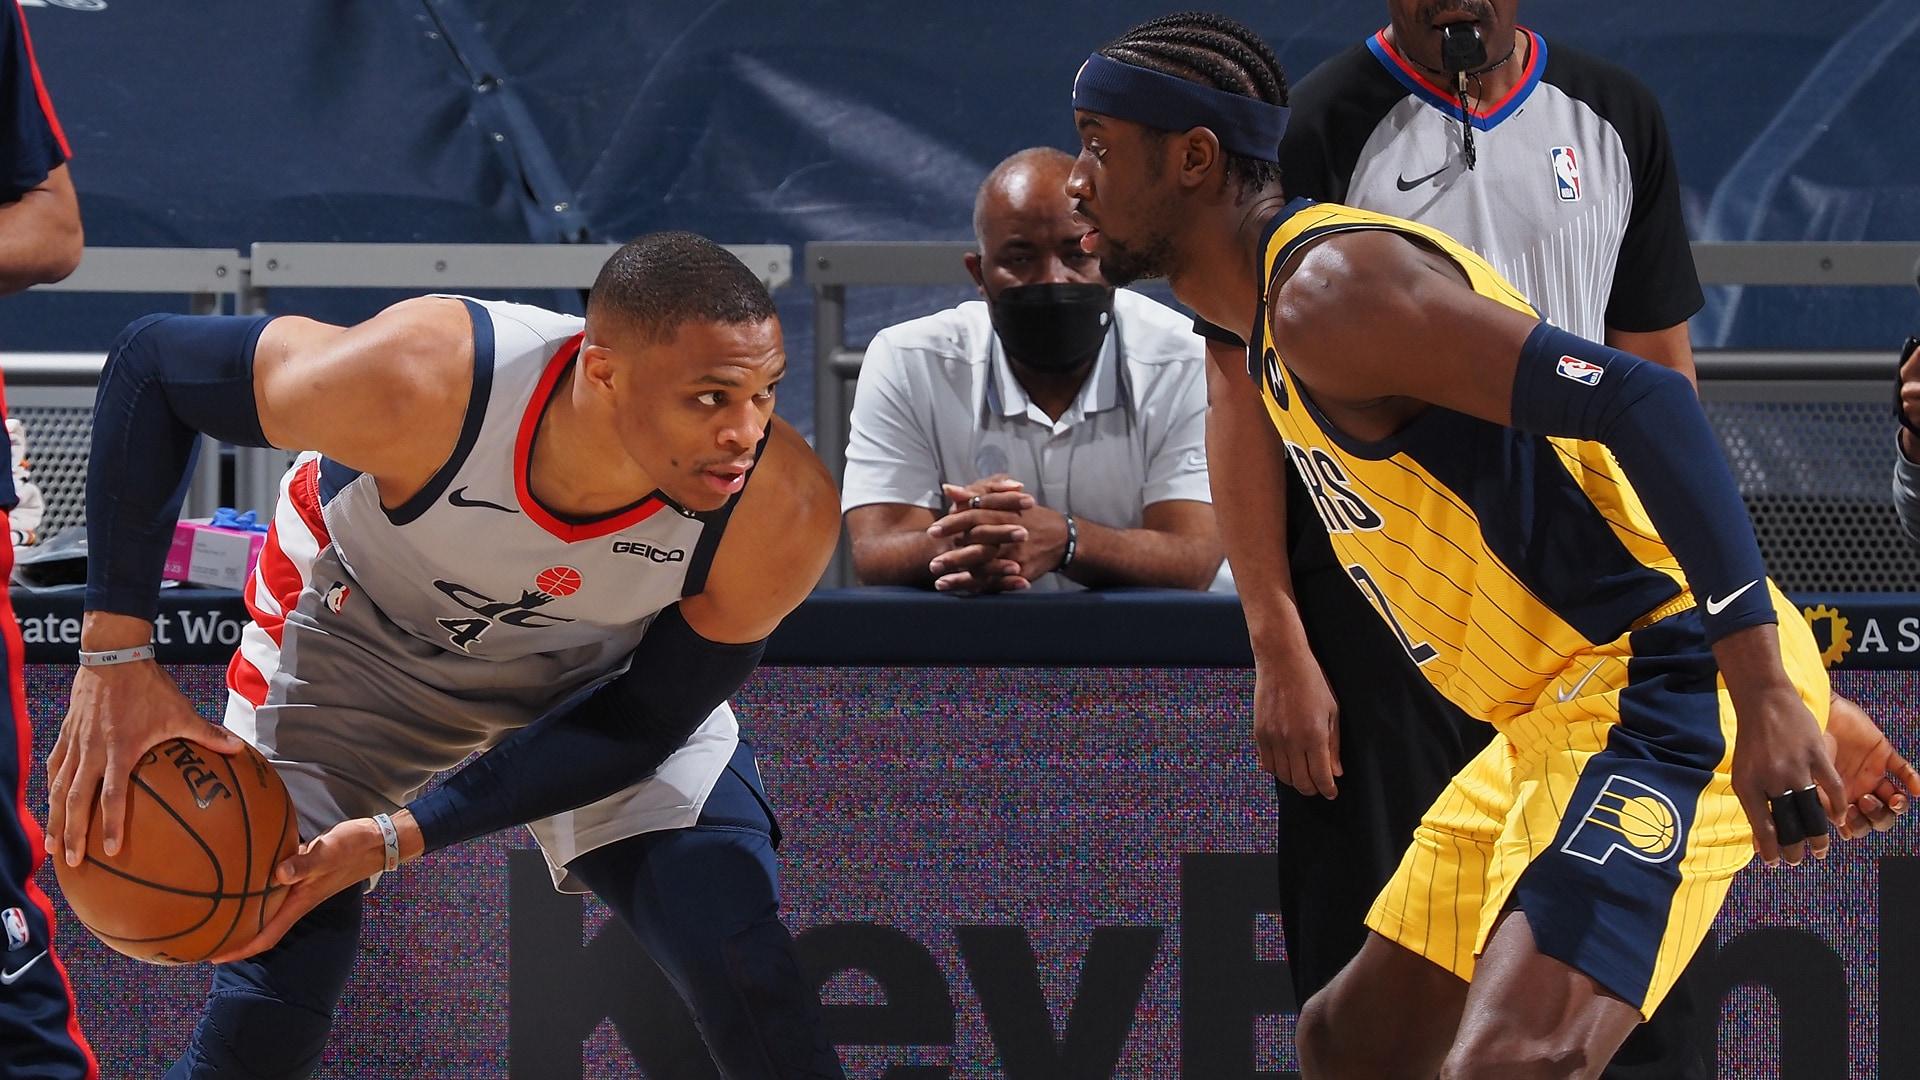 Game Recap: Wizards 133, Pacers 132